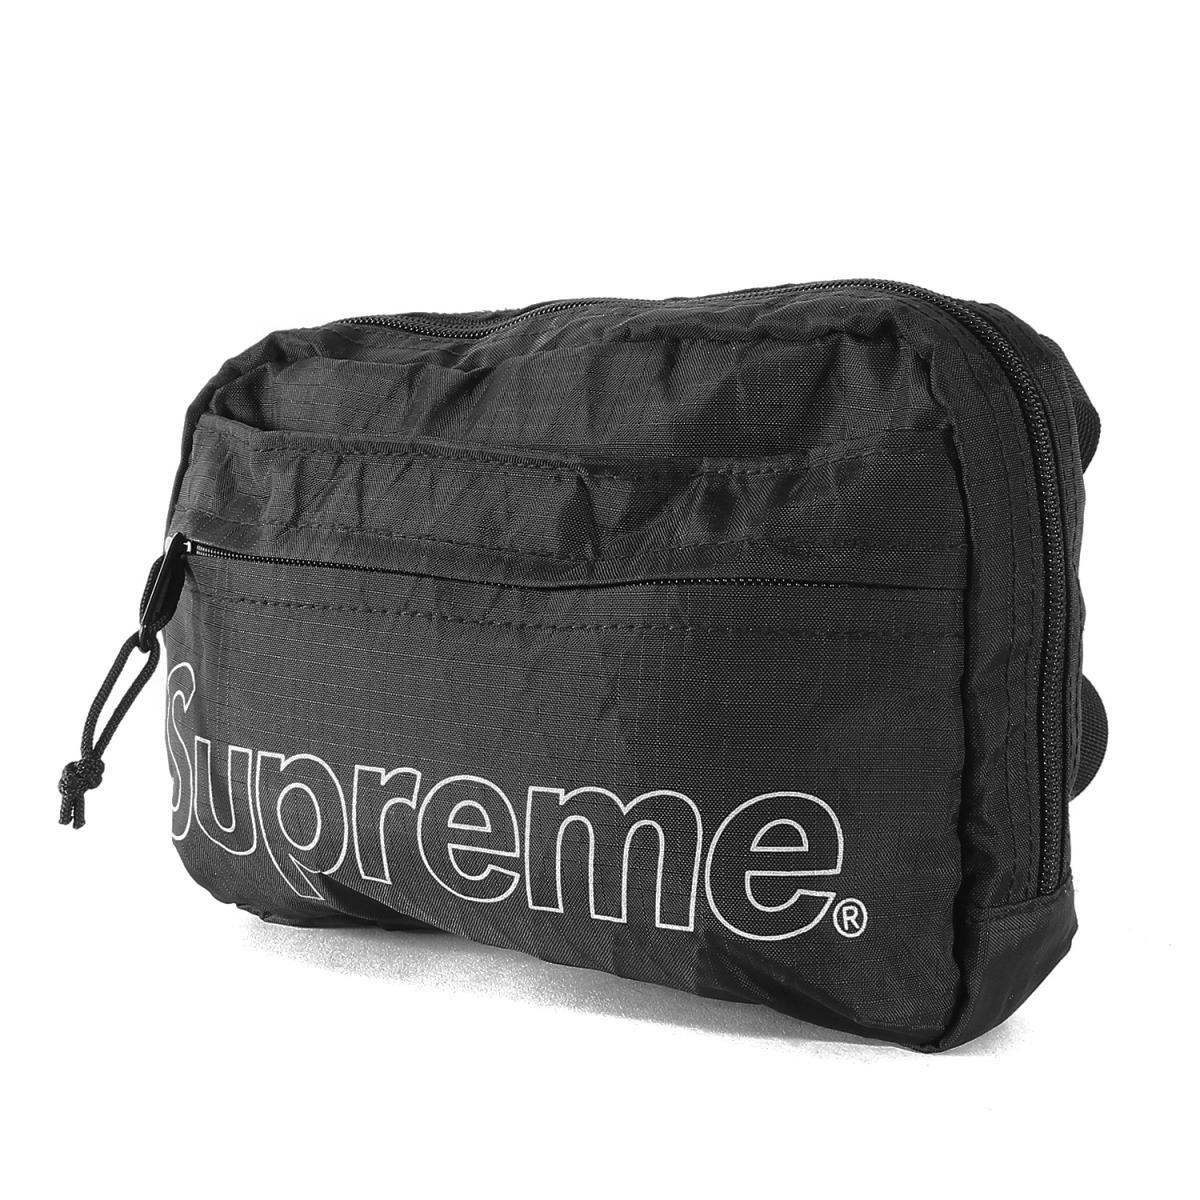 Supreme (シュプリーム) バッグ ブランドロゴ X-PAC ショルダーバッグ Shoulder Bag 18年秋冬 ブラック 【メンズ】【美品】【K2234】【中古】【あす楽☆対応可】